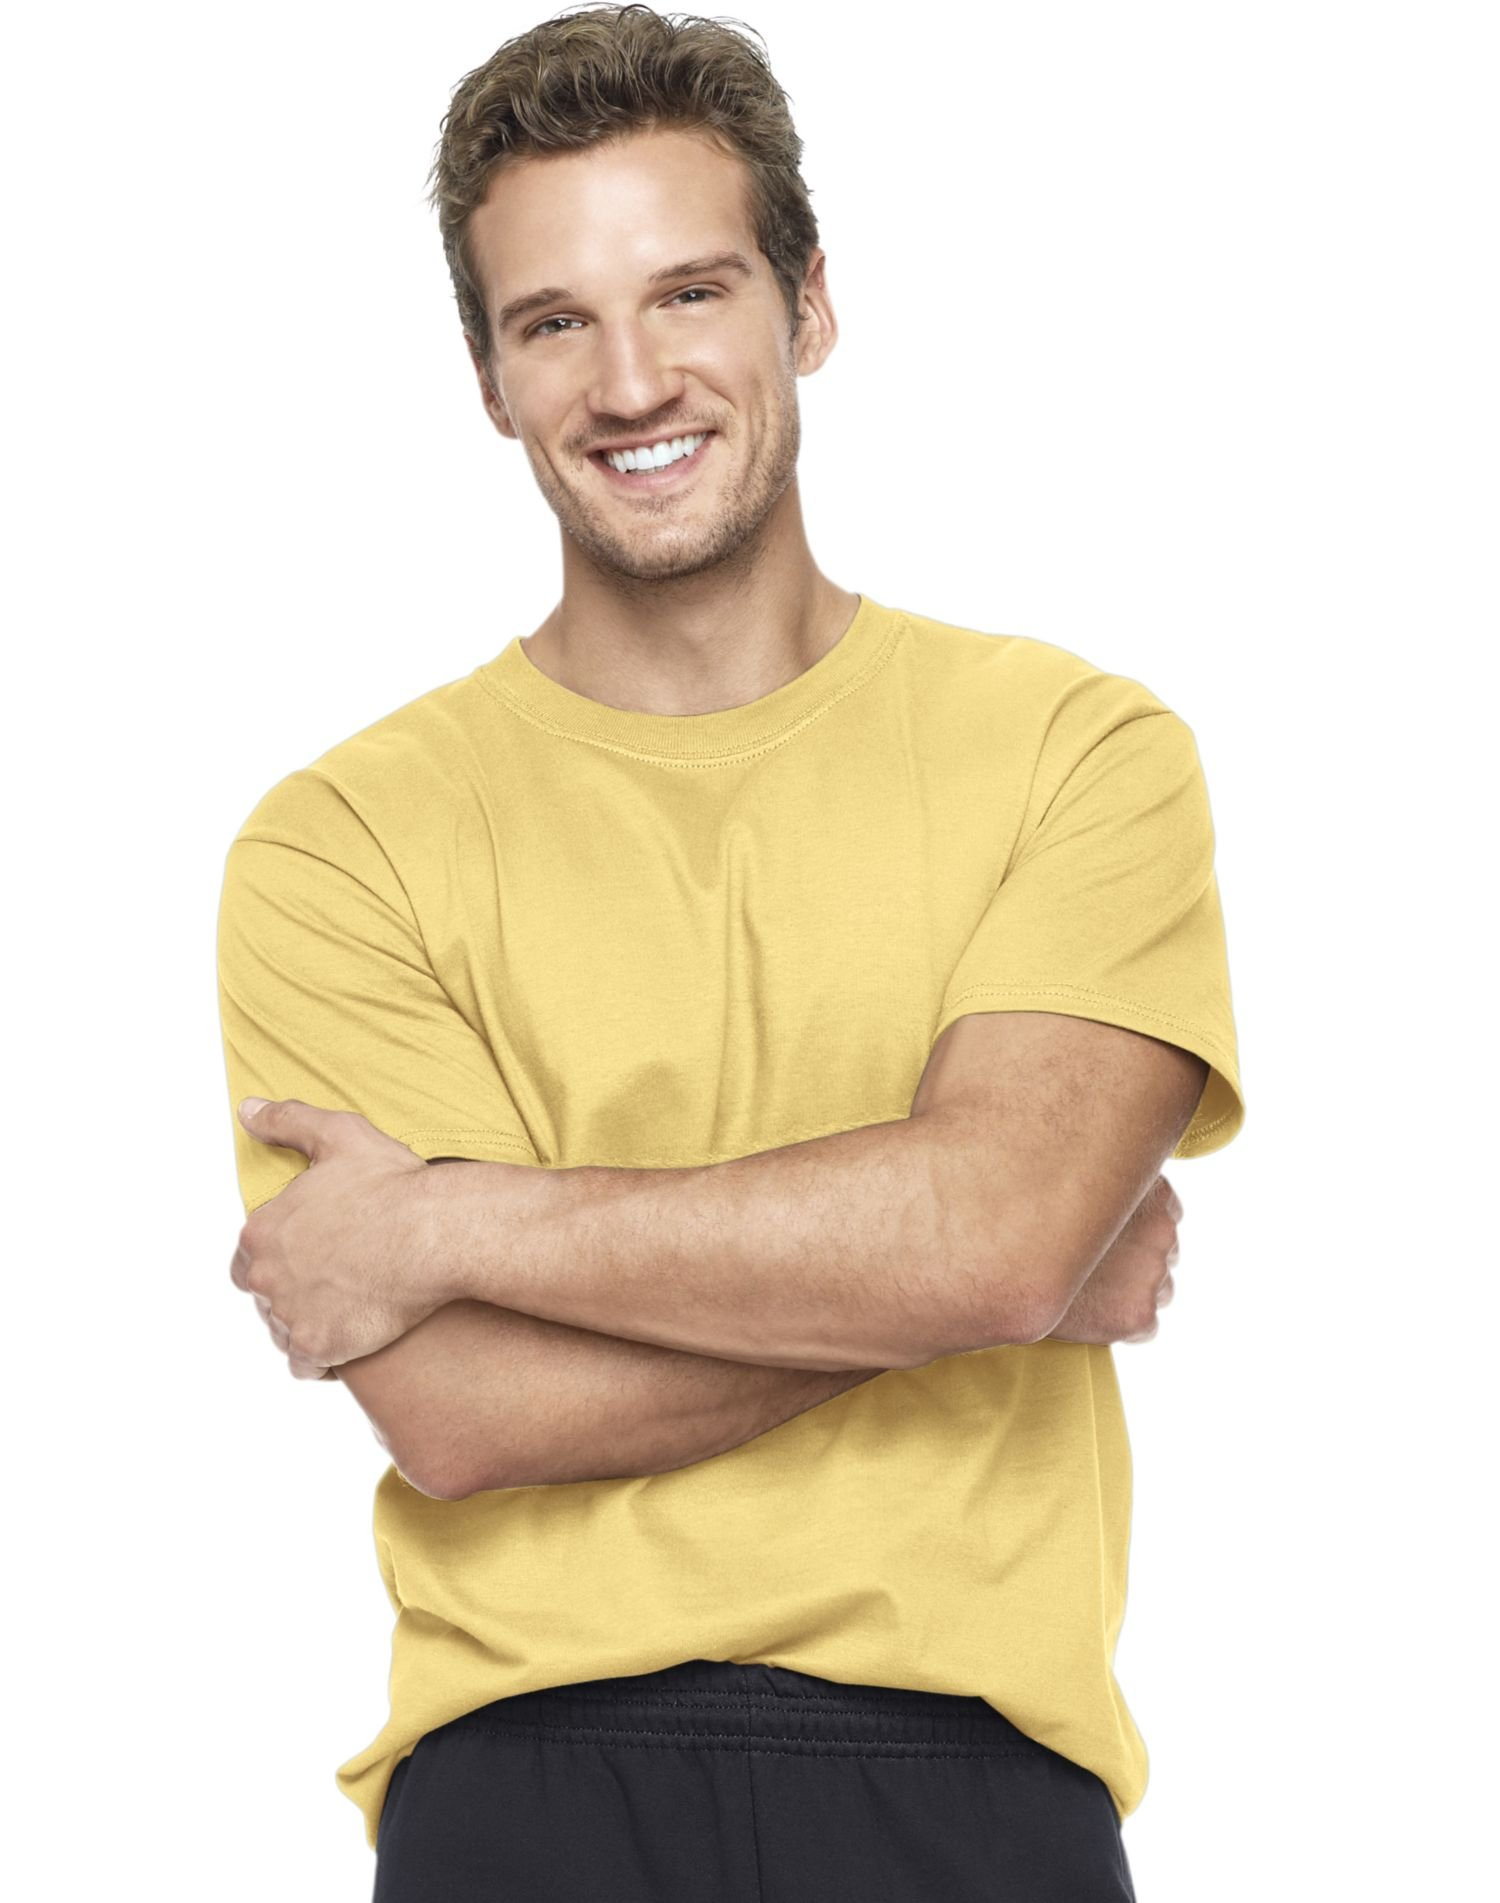 Hanes 5180 Hanes Beefy-T Adult Short-Sleeve T-Shirt,Daffodil Yellow,3XL